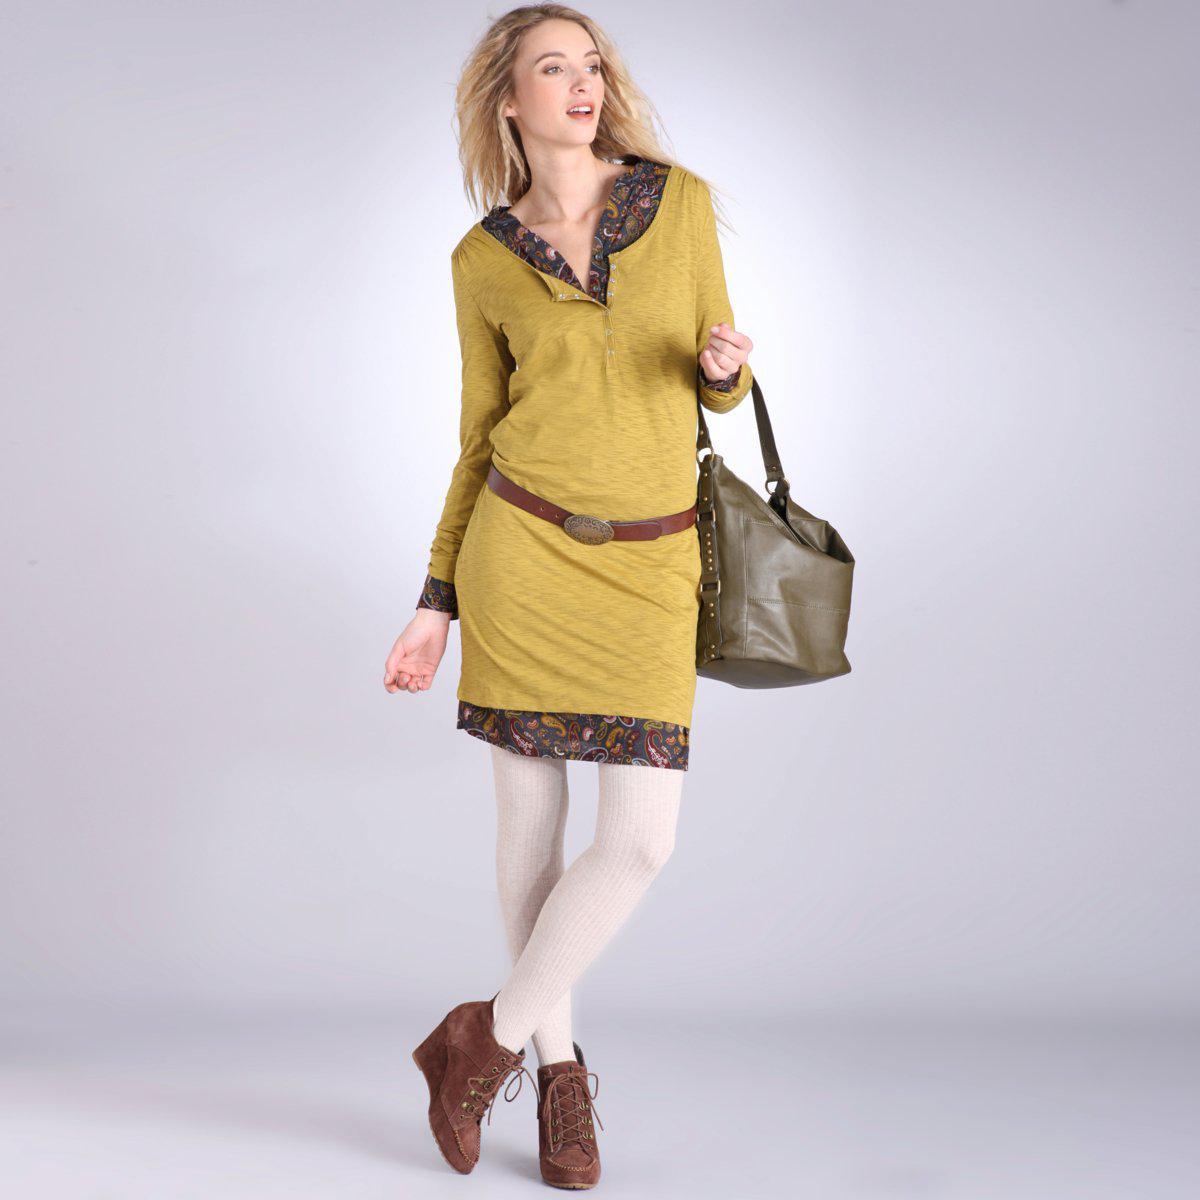 bradyna foremata 278 - Βραδυνα Φορεματα LaRedoute Χειμώνας 2012 Κωδ. 324205478